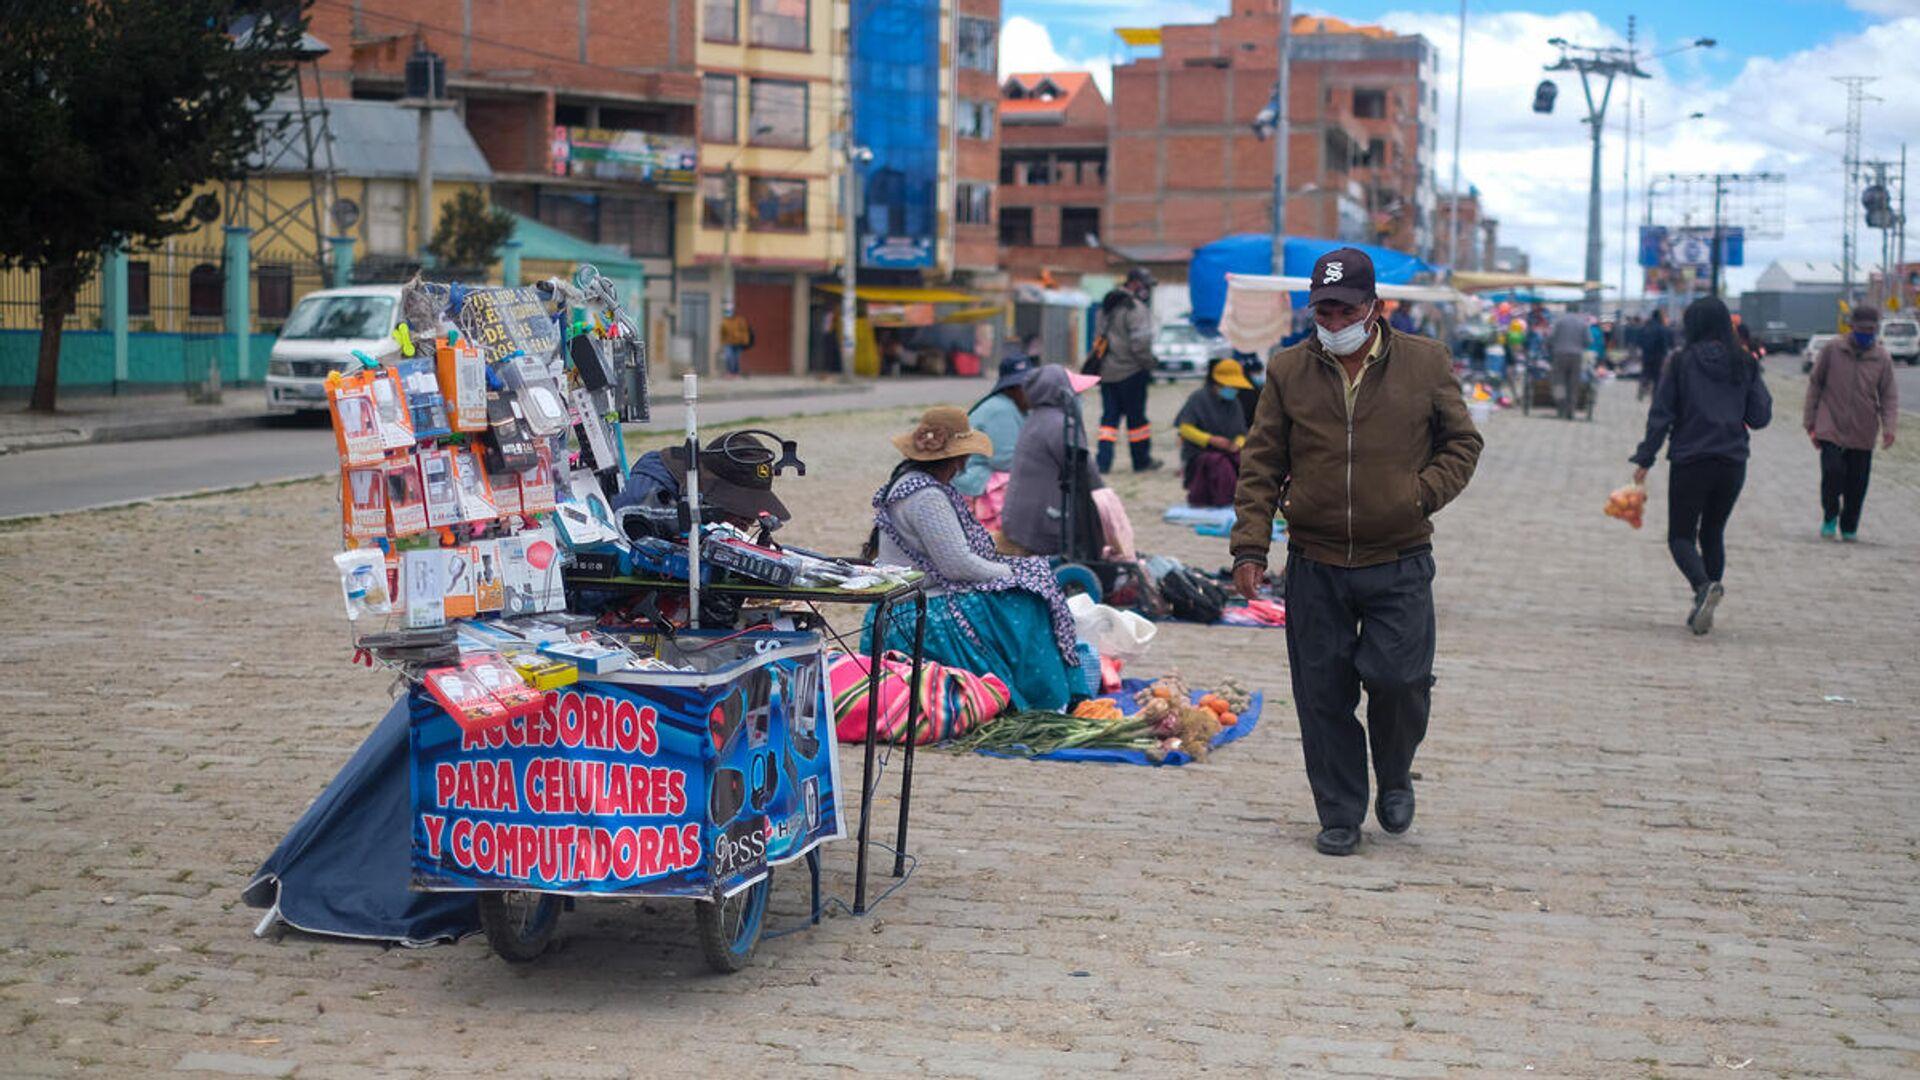 Venta ambulante en Bolivia - Sputnik Mundo, 1920, 08.06.2021